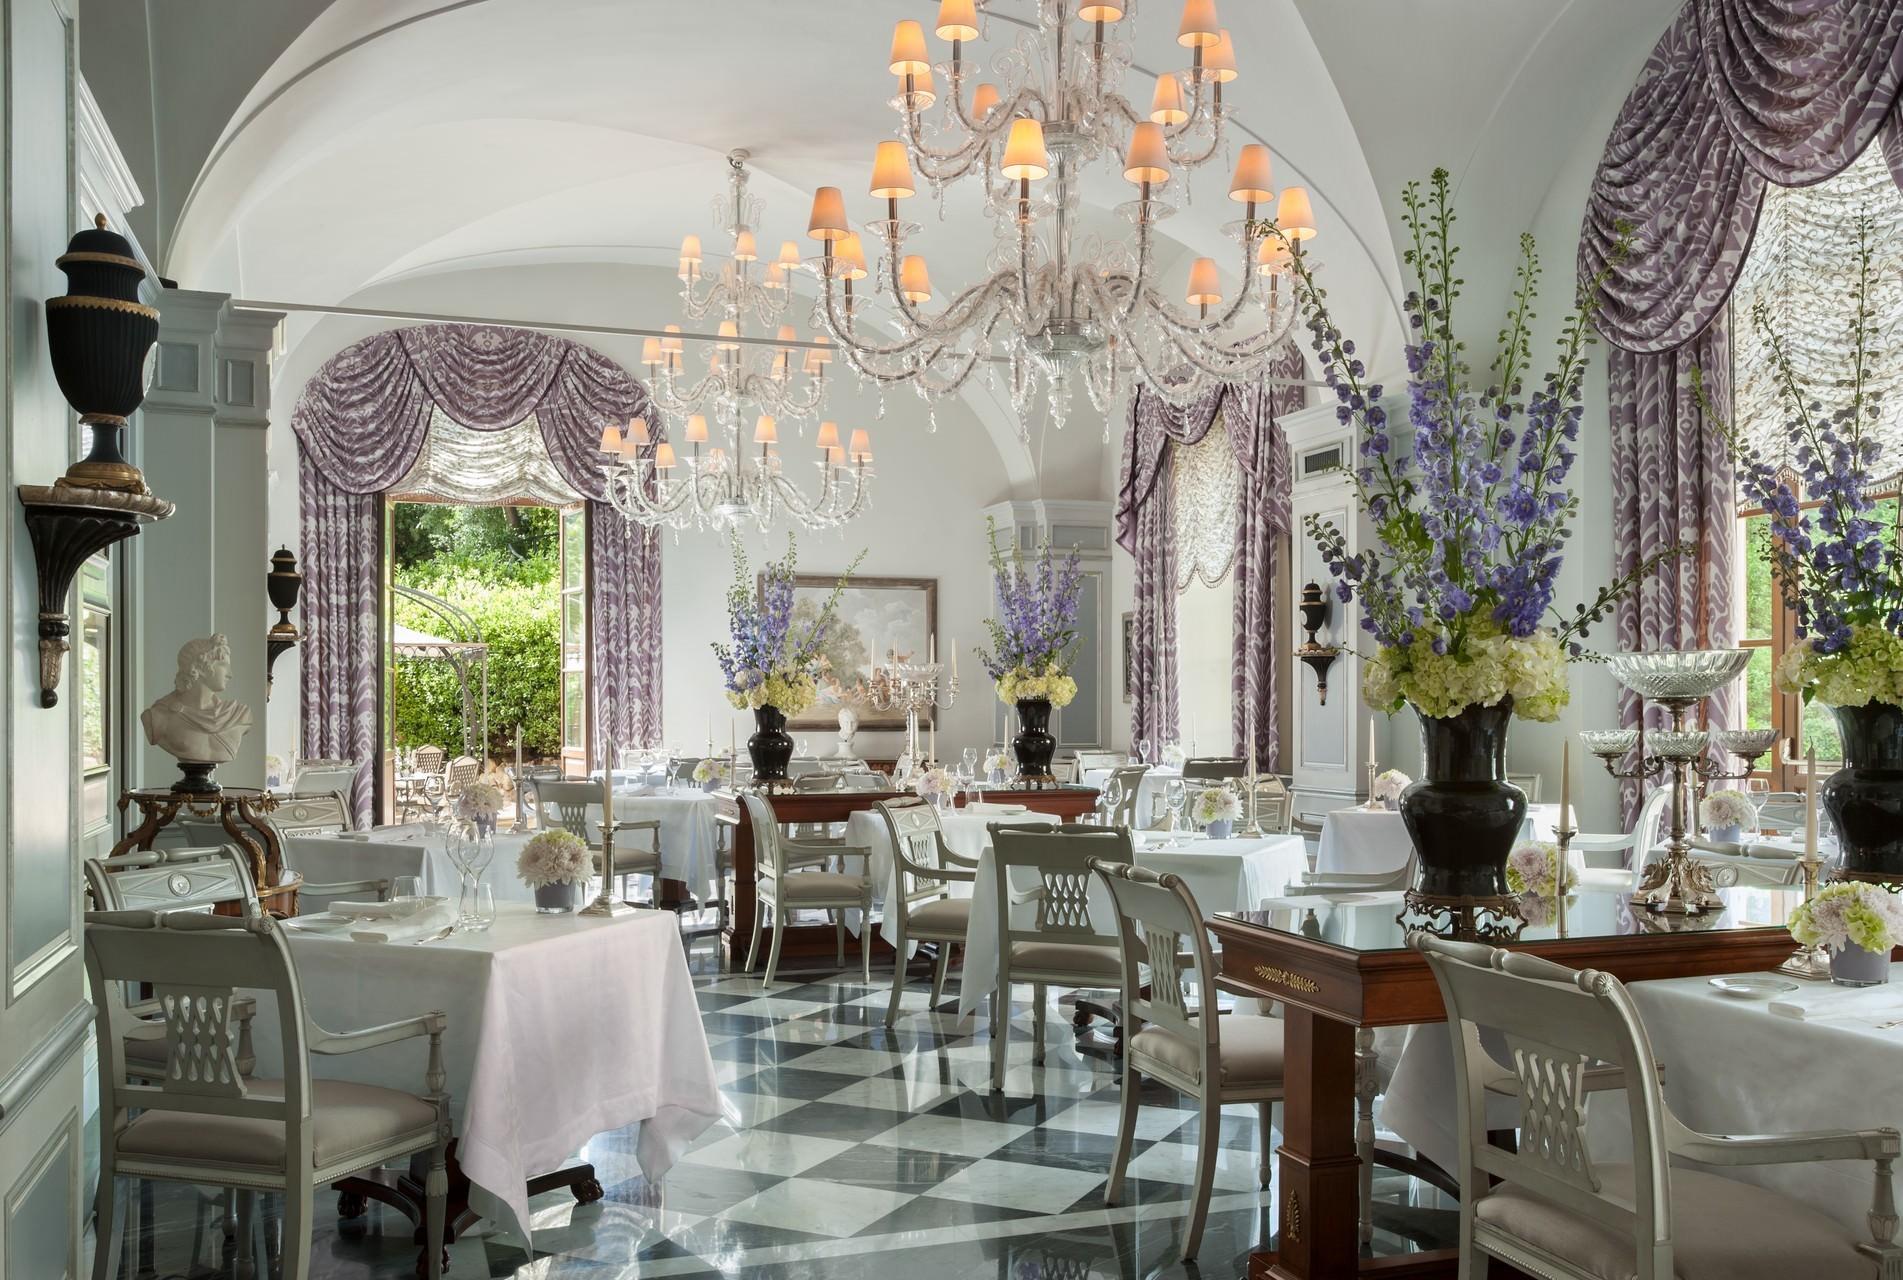 Four Seasons Hotel Firenze_Il Palagio Restaurant